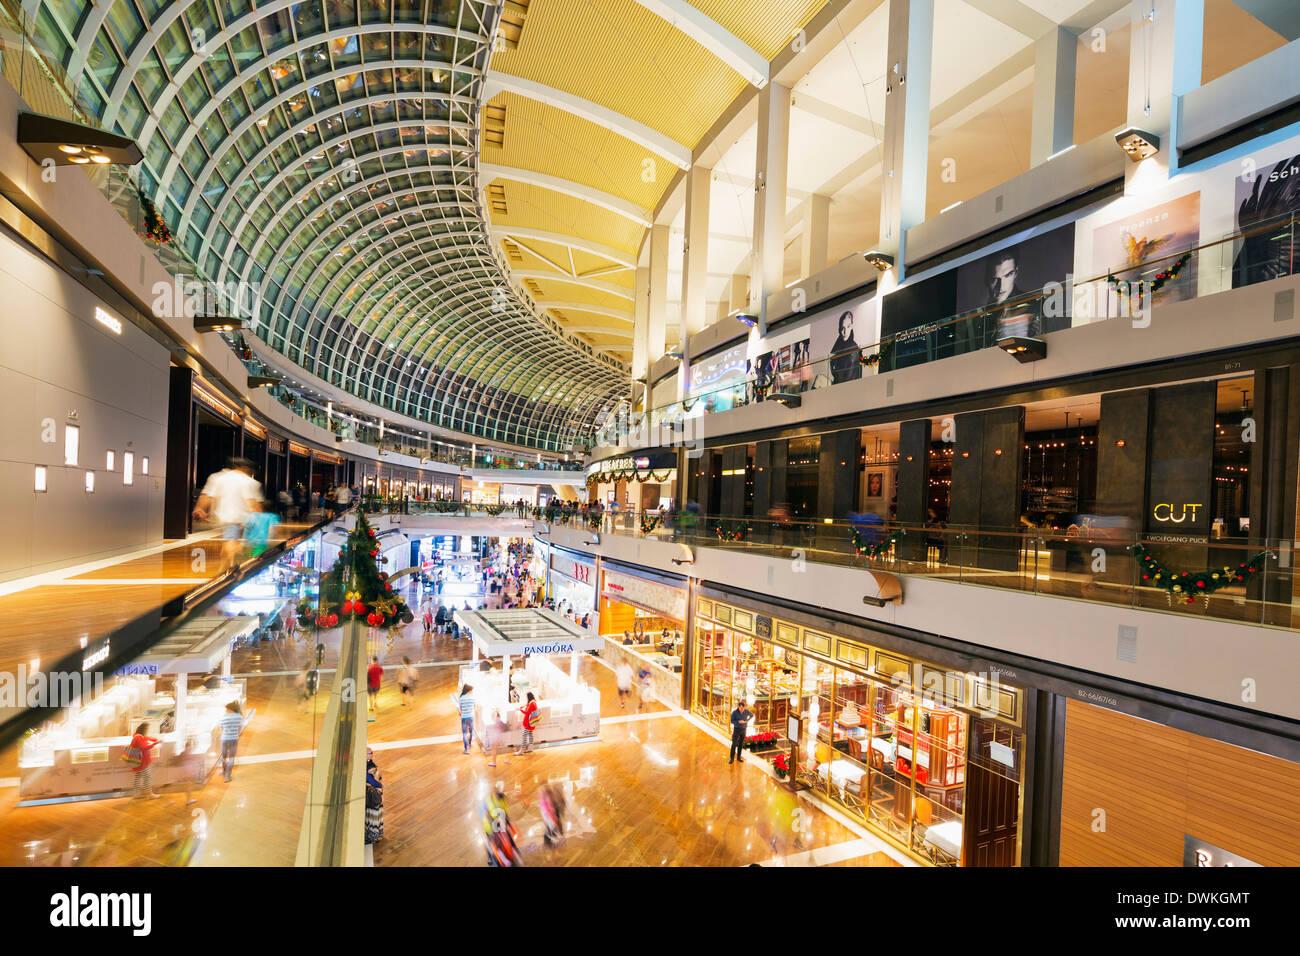 Marina Bay Sands Mall, Singapore, Southeast Asia, Asia - Stock Image